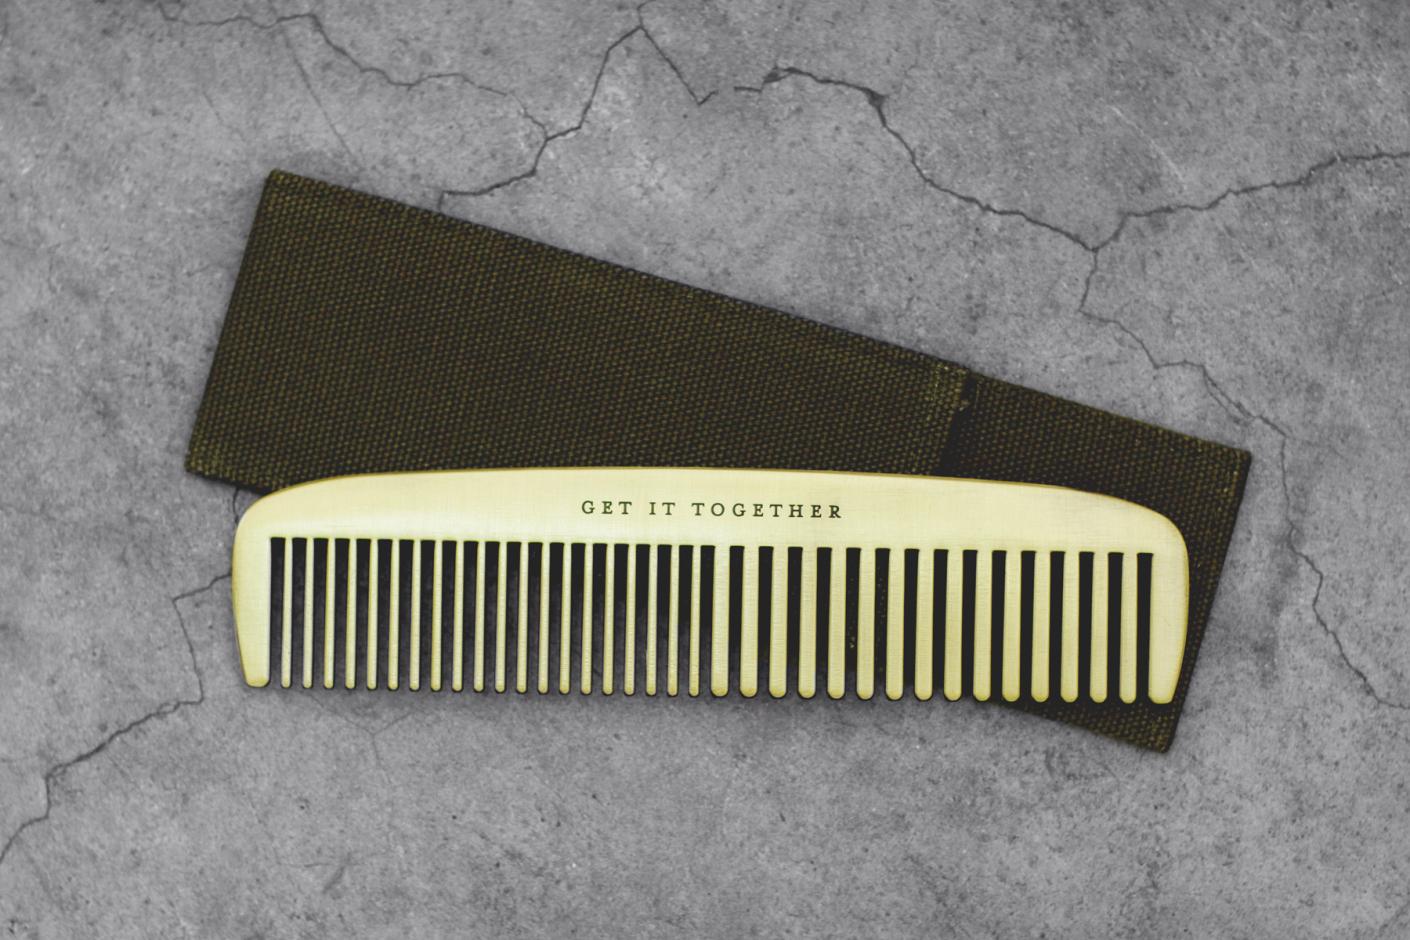 izola-get-it-together-brass-comb-2